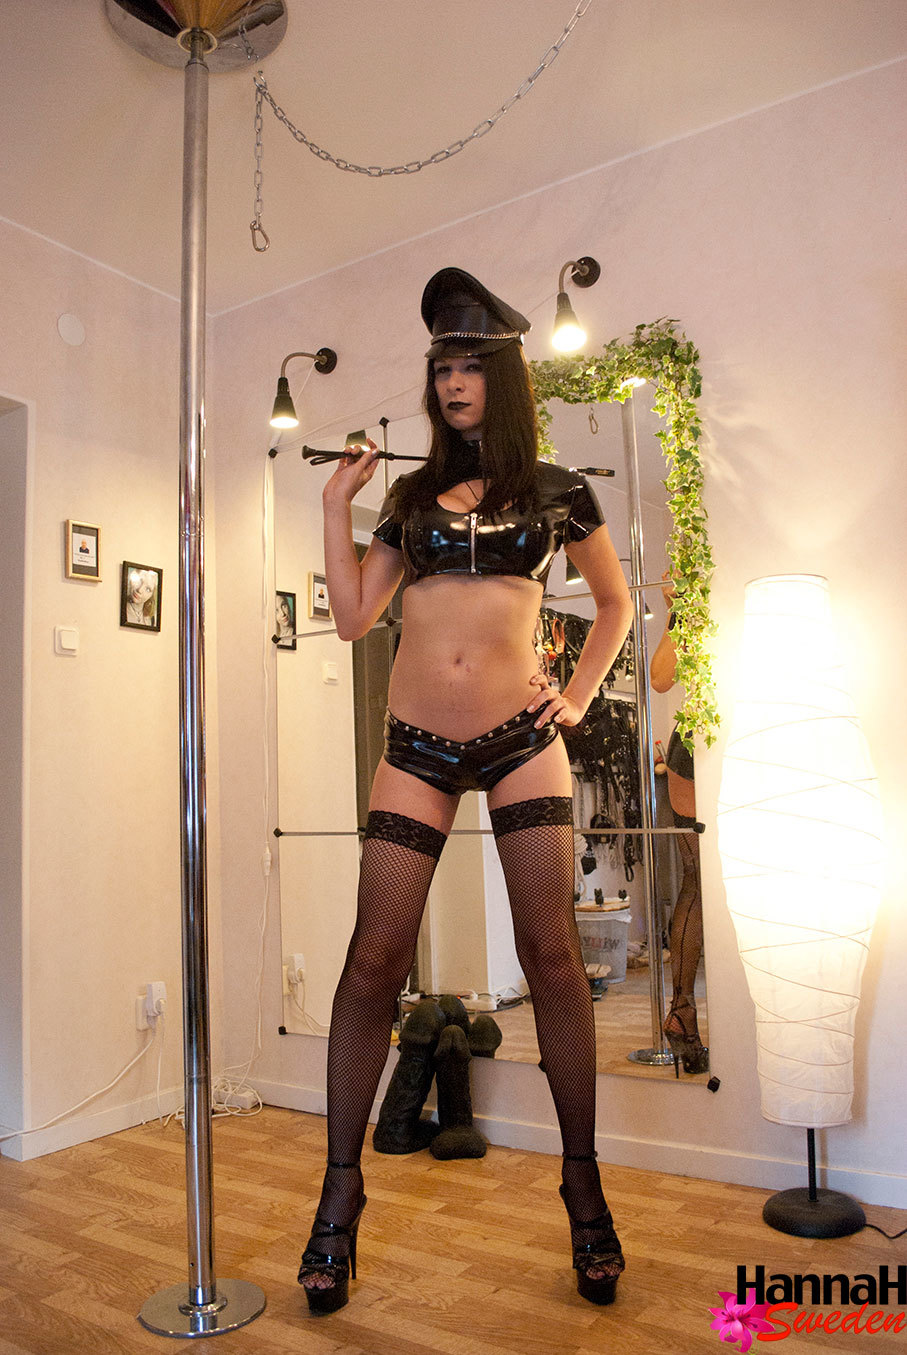 Yummy European Transexual Dressing Like A Master